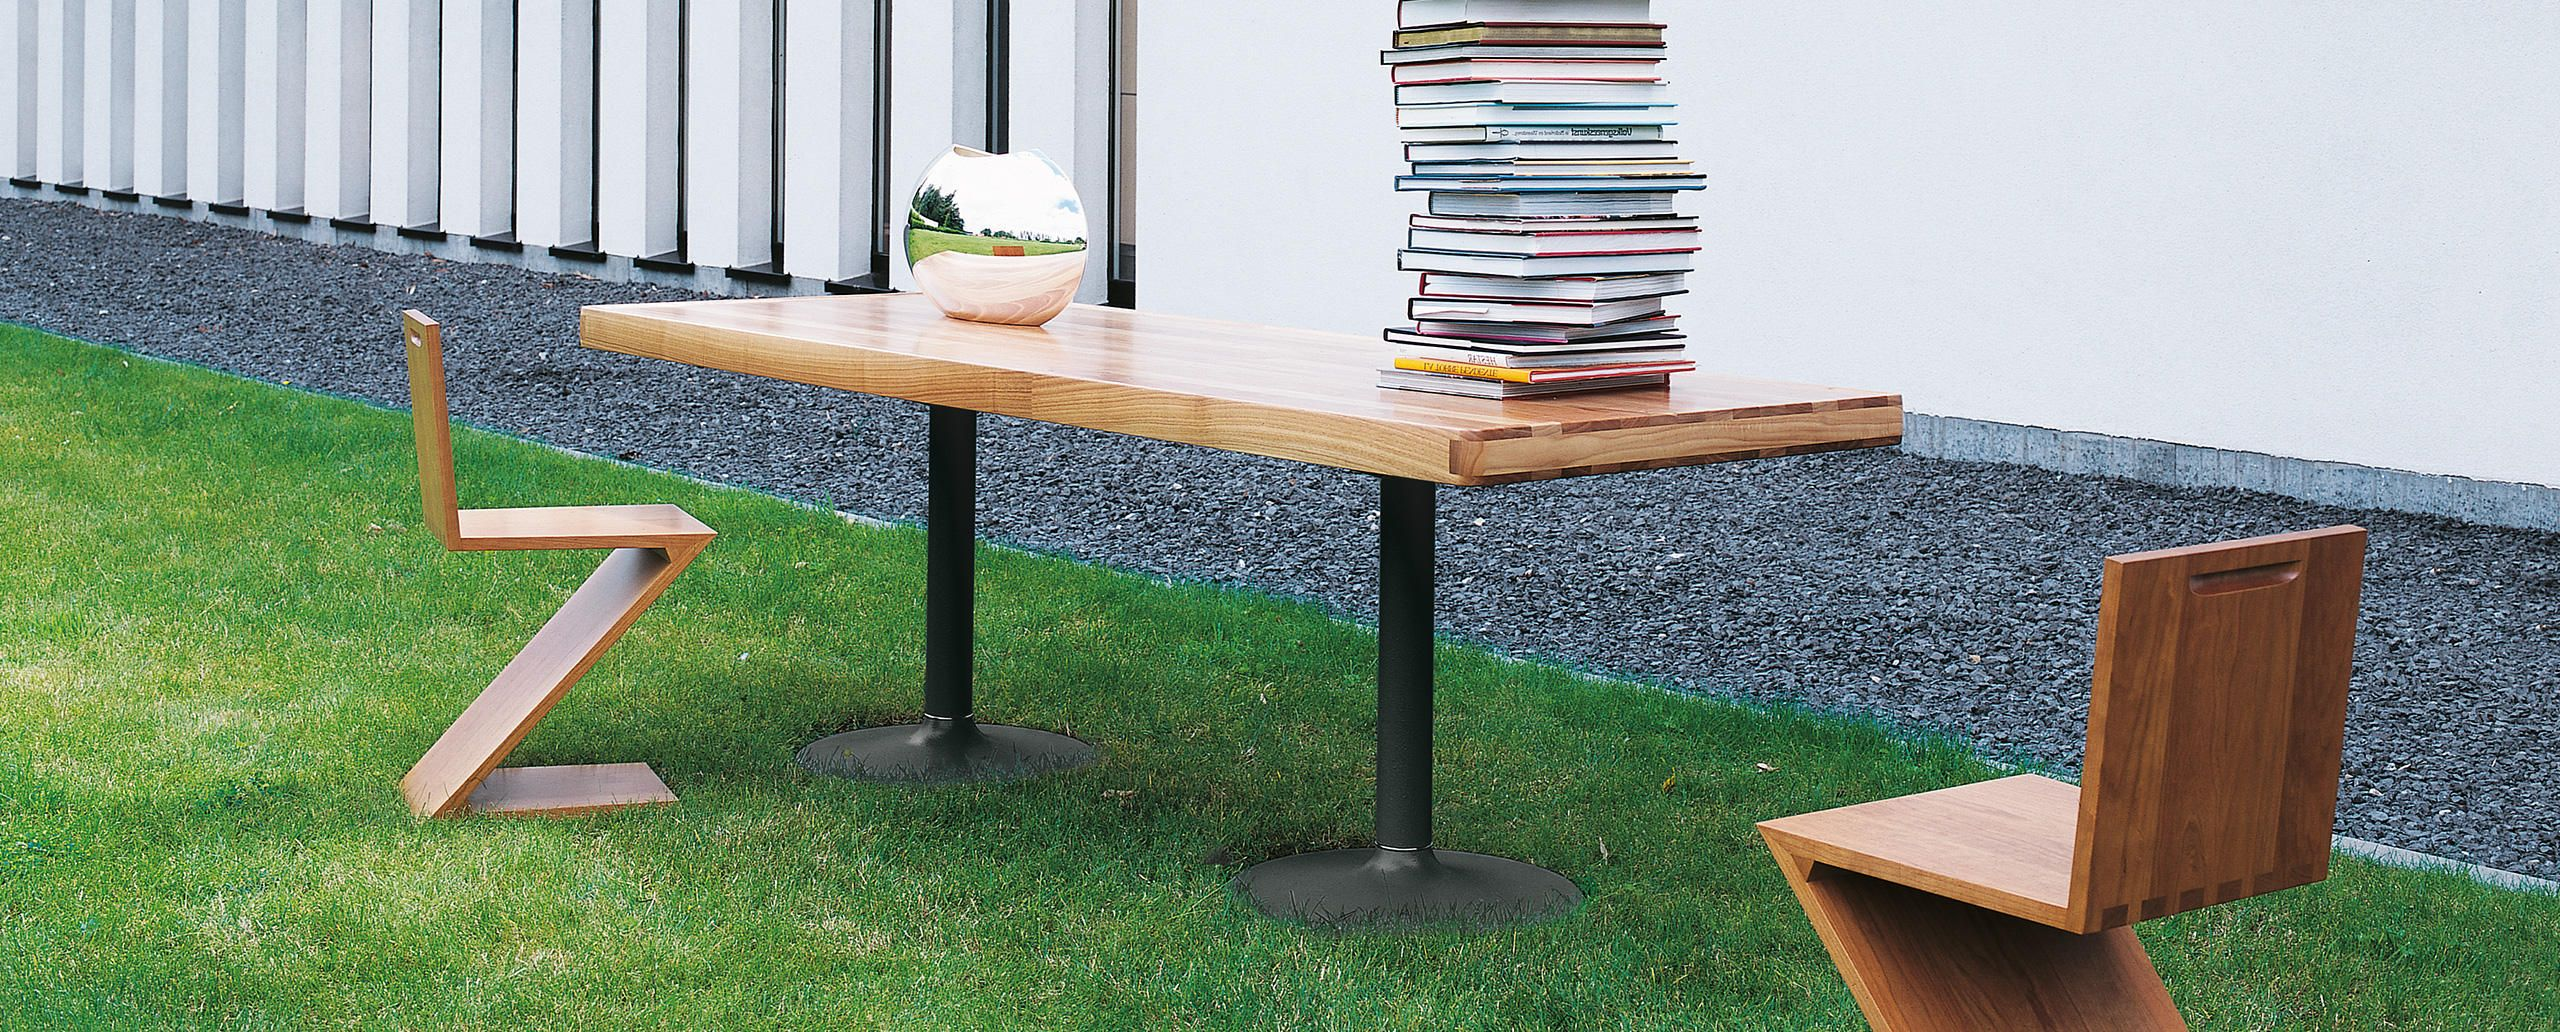 bf116367854f6ef96df2aab78a63578c Incroyable De Table Basse Le Corbusier Concept